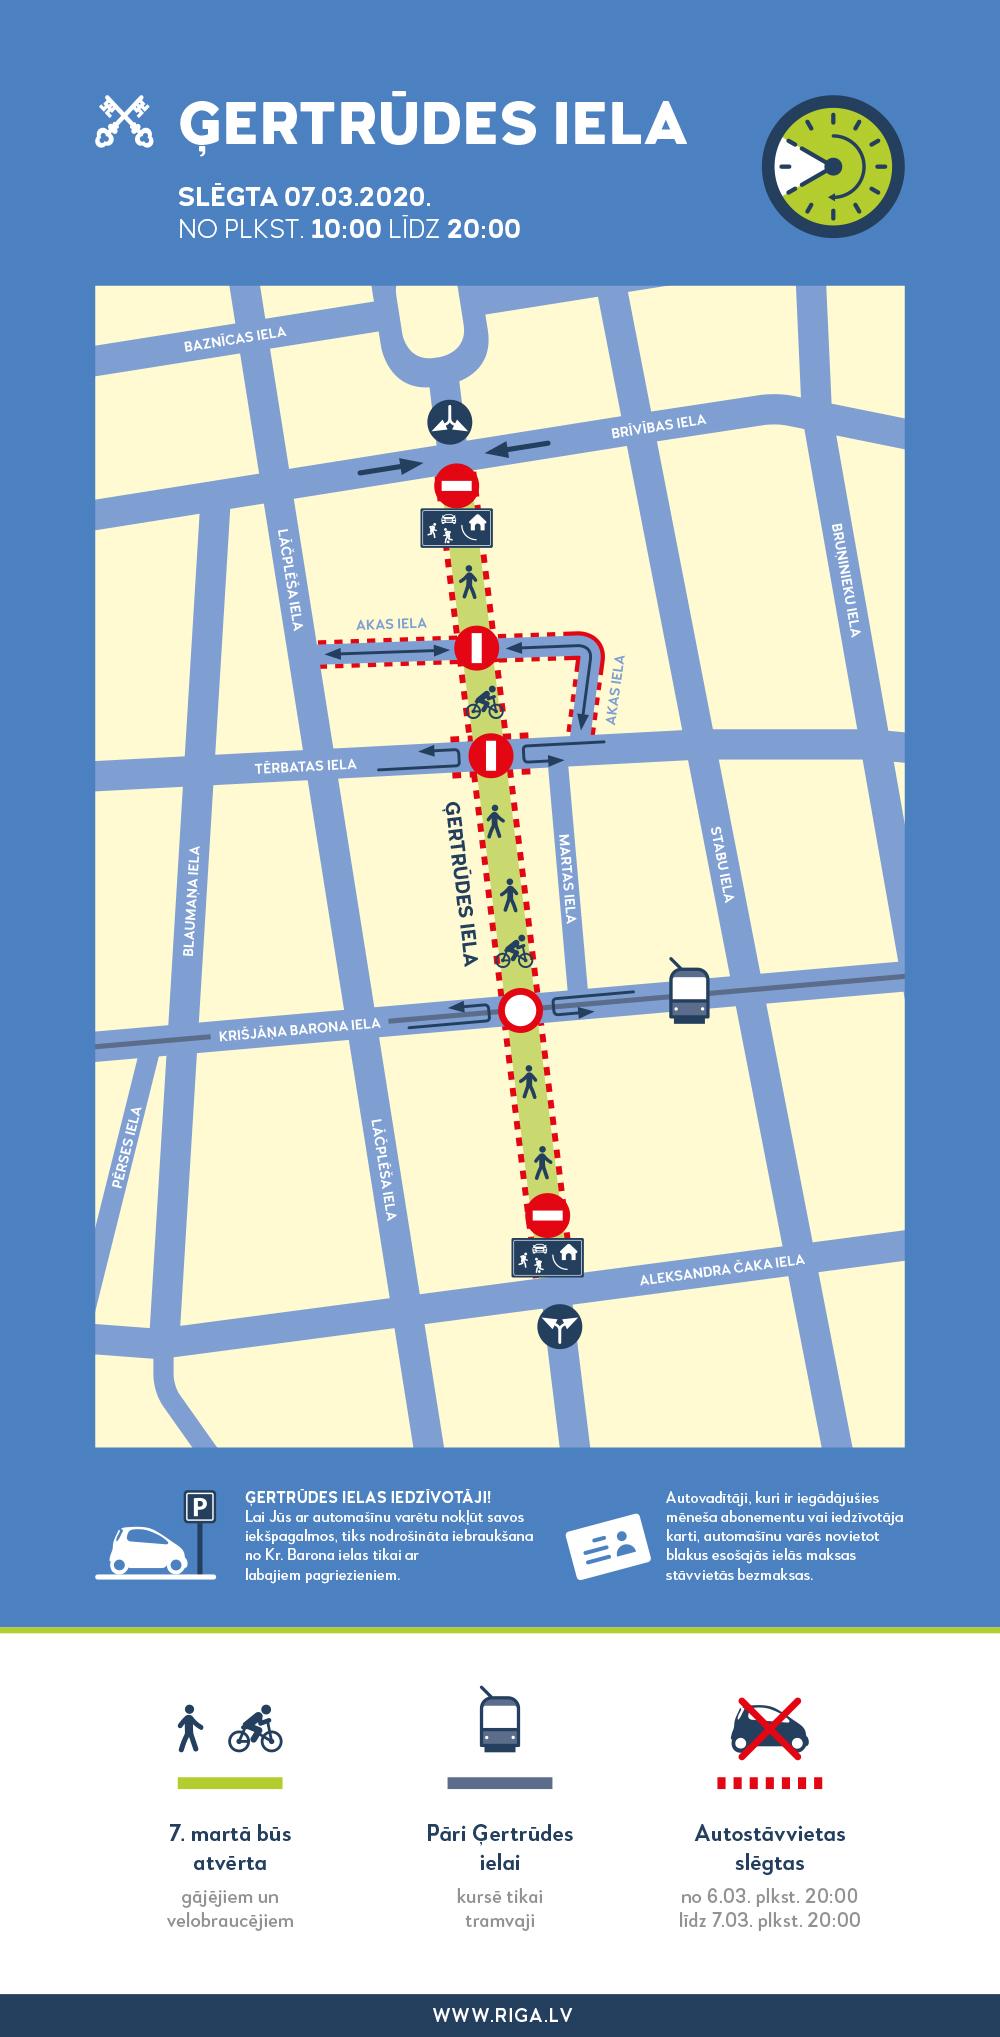 rd-gertrudes-ielas-slegsana-2020-infografika-1000px.jpg